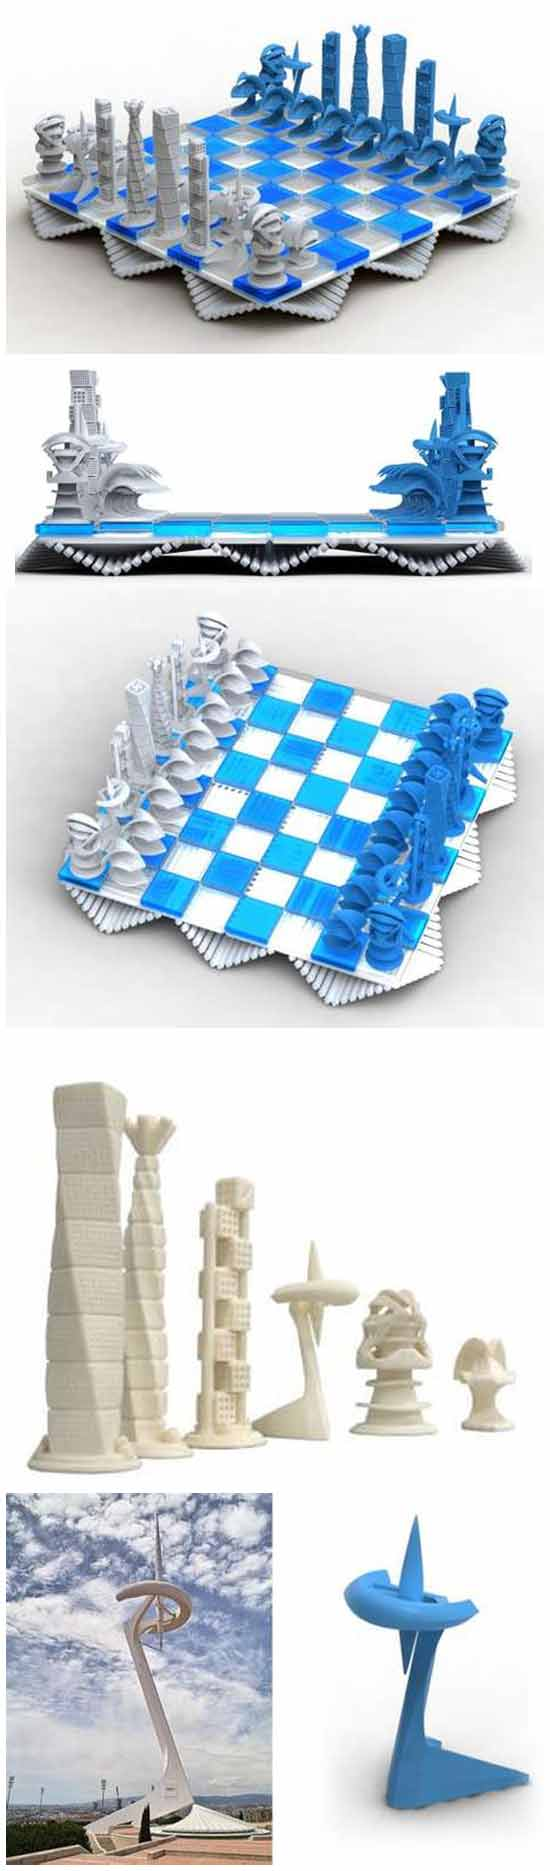 Архитектурные шахматы